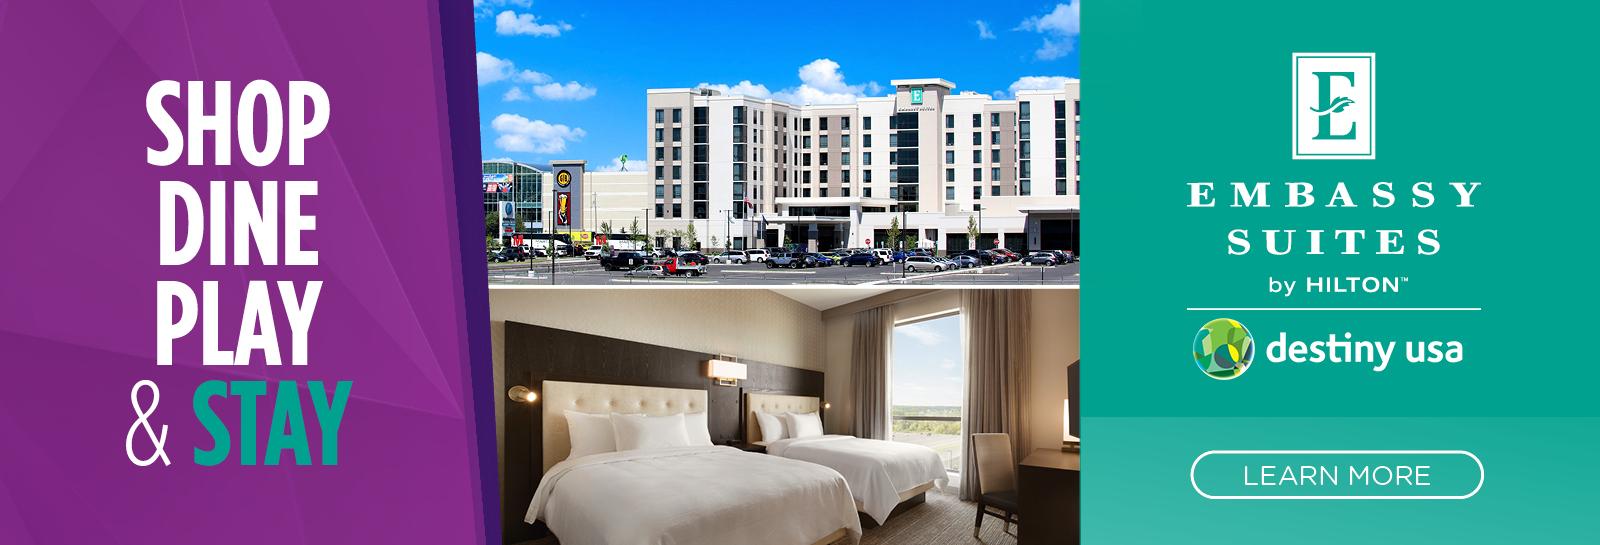 2019 Hotel HomepageSlider 1600x545